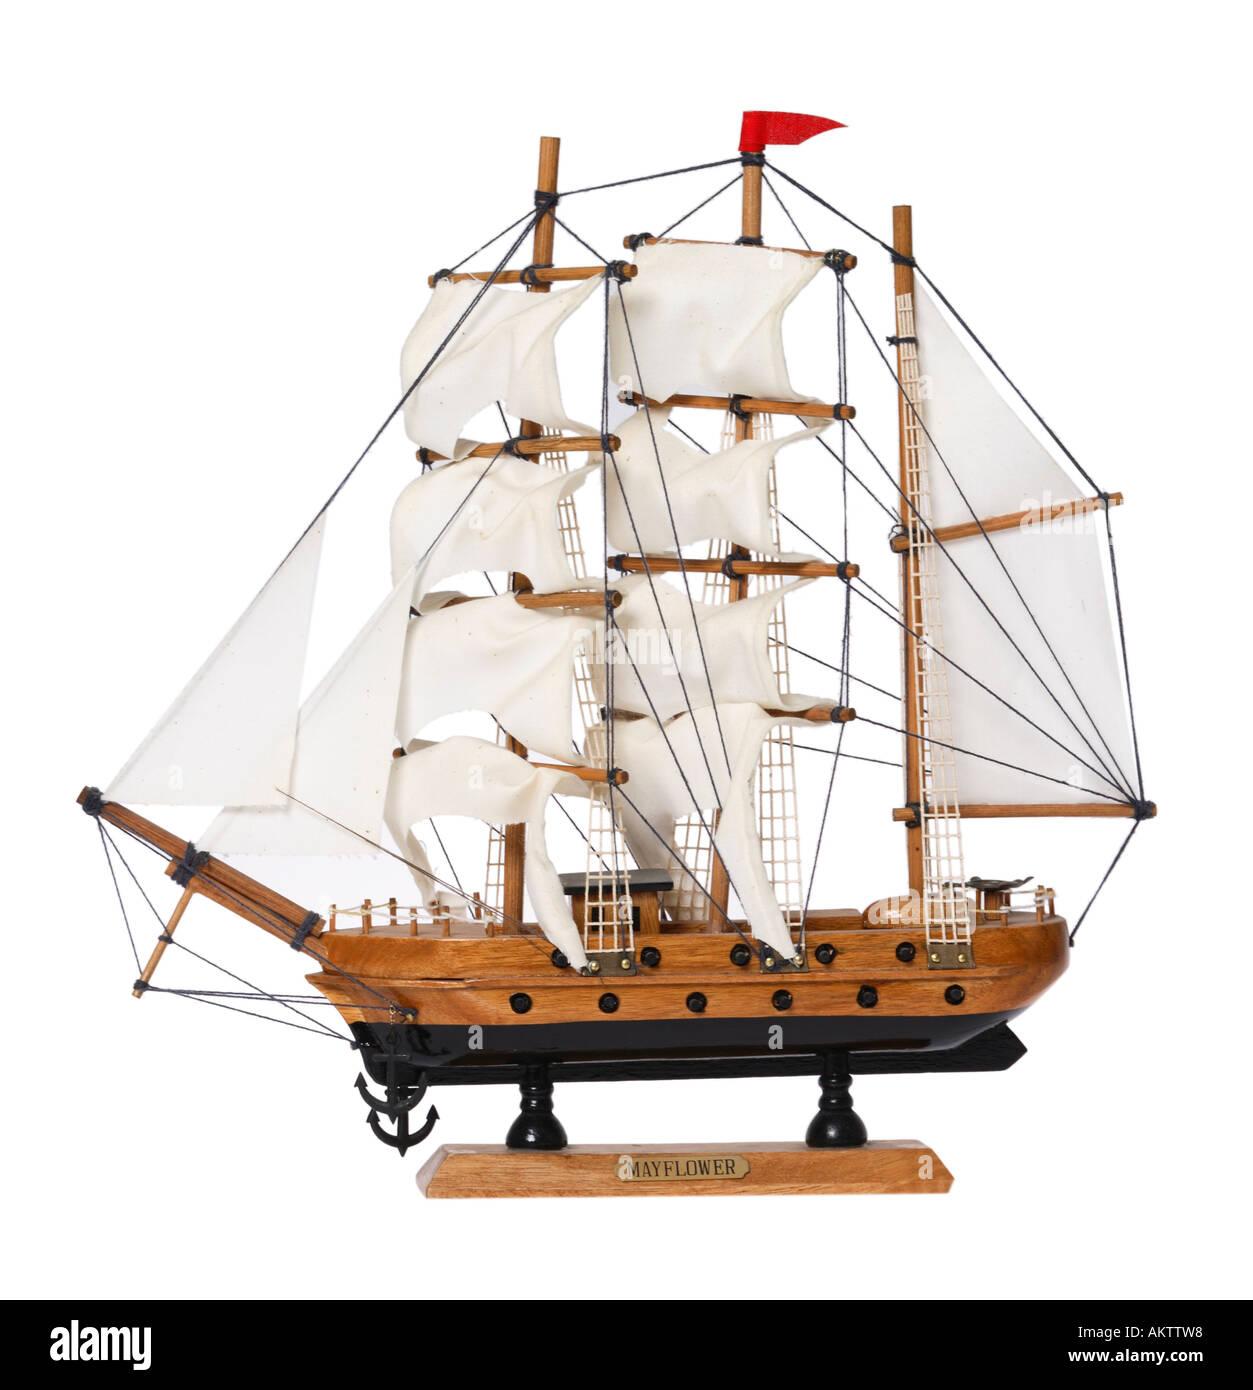 Mayflower ship model stock photo 8613527 alamy for Mayflower car shipping